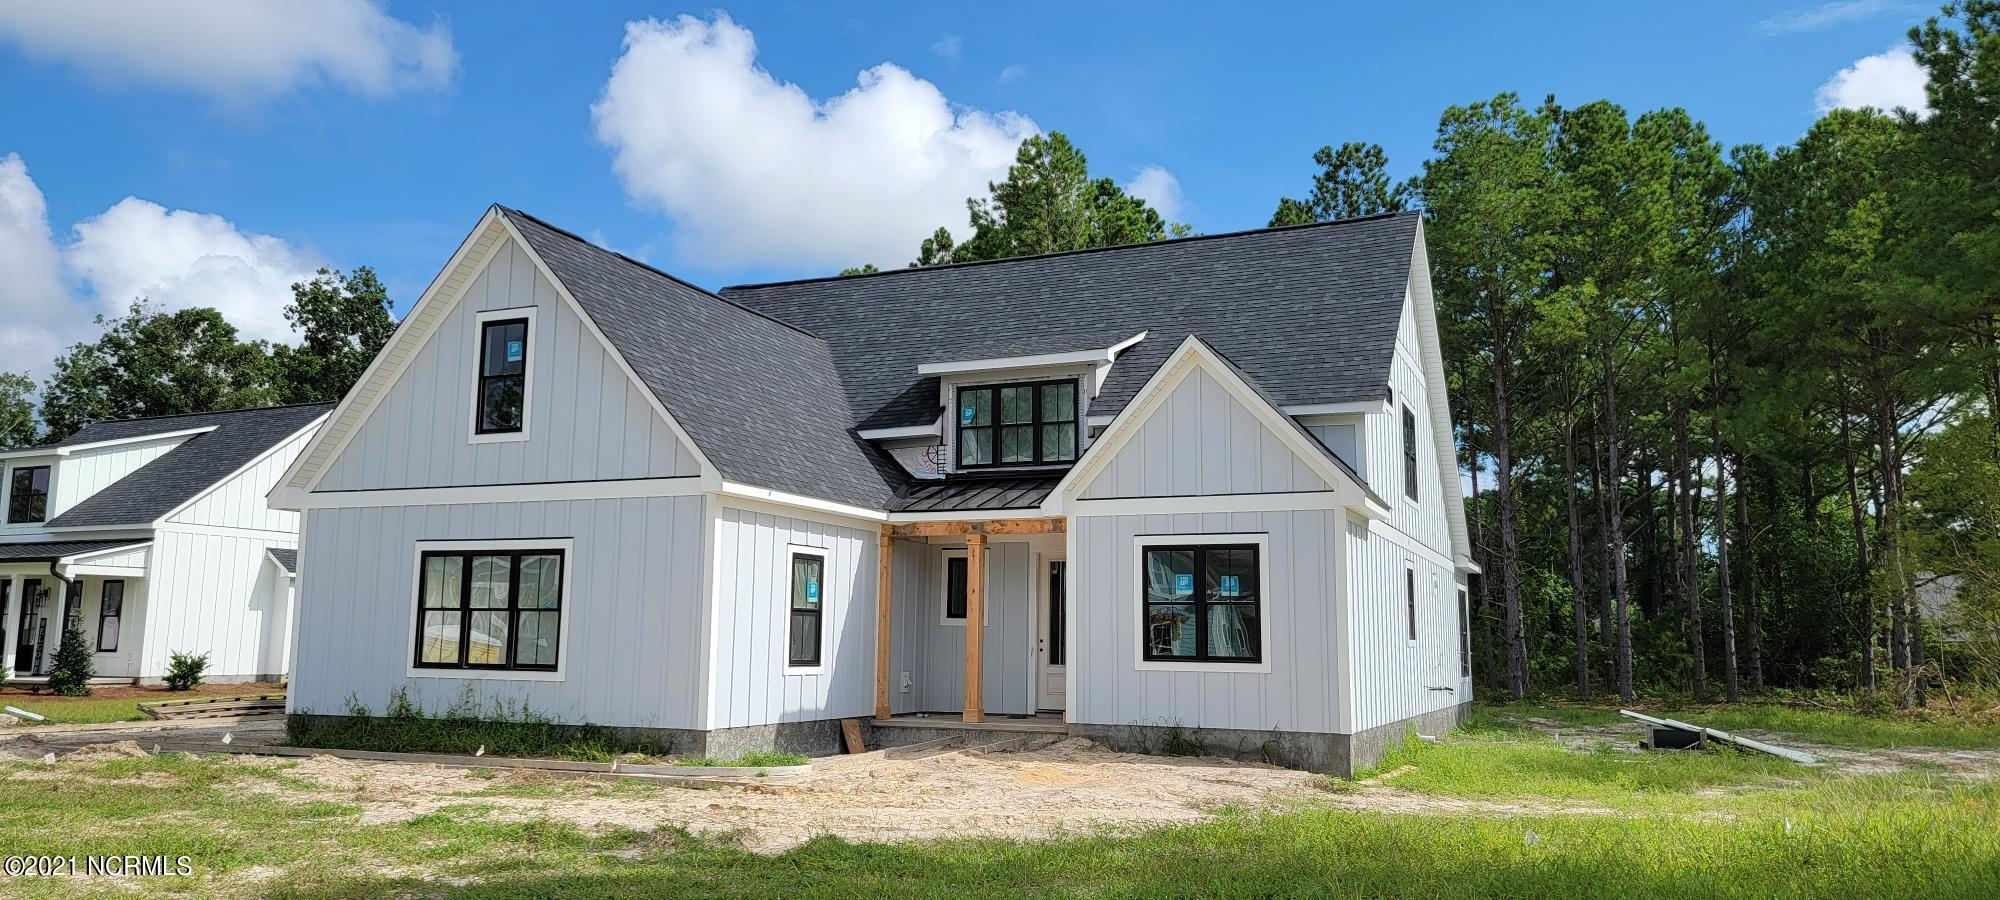 101 Berkshire Lane, Hampstead, North Carolina 28443, 4 Bedrooms Bedrooms, 11 Rooms Rooms,4 BathroomsBathrooms,Single family residence,For sale,Berkshire,100248146